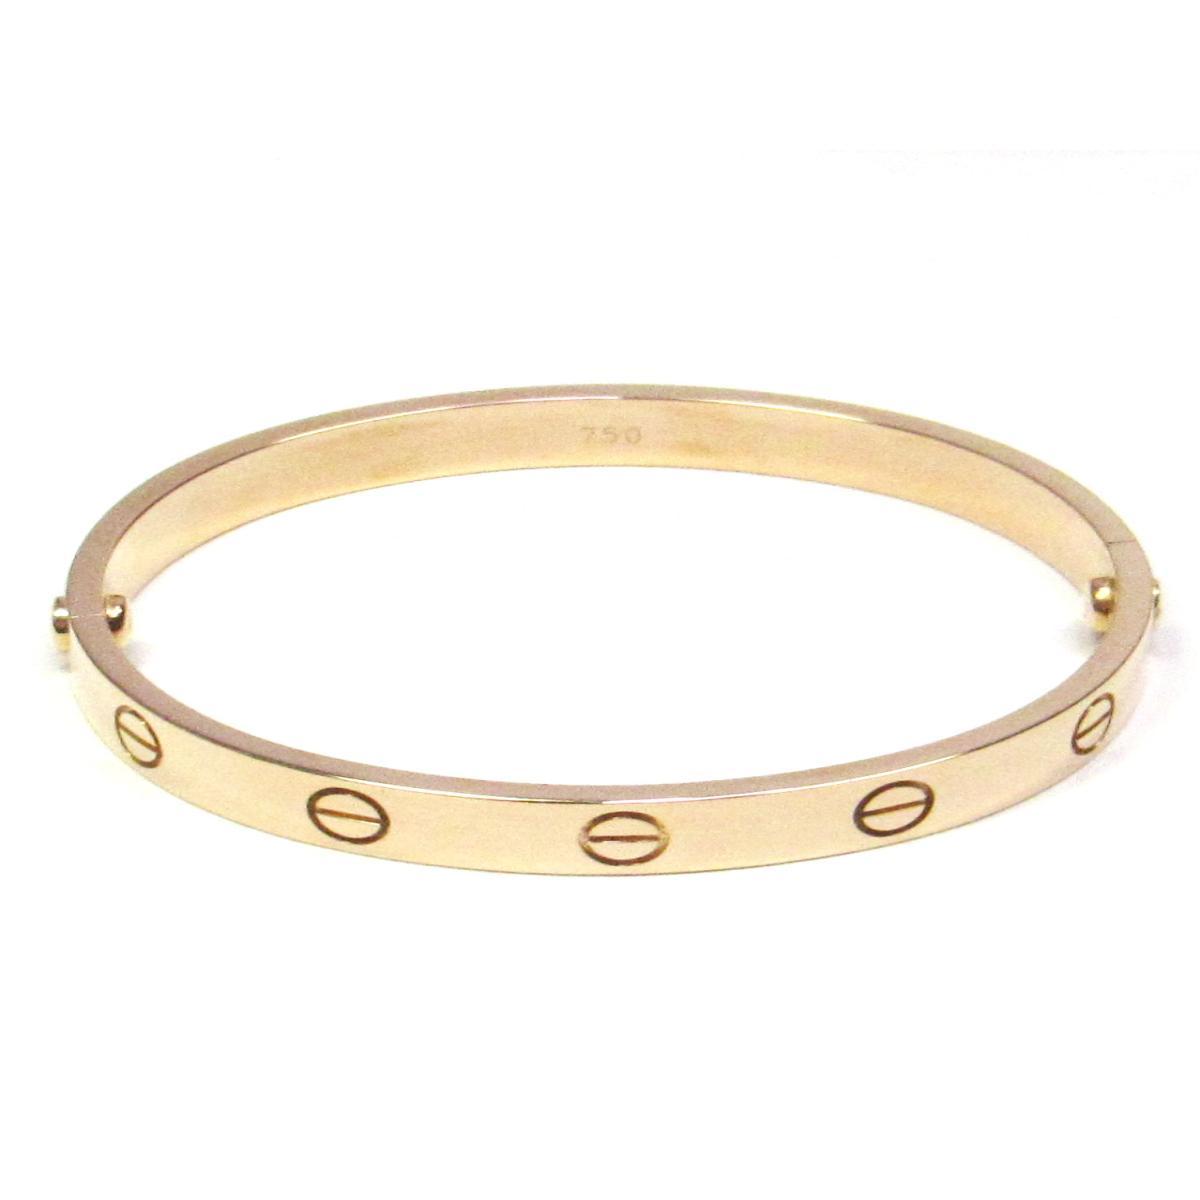 2071b3f88e499 Auth Cartier Love Bracelet Bangle #16 18KPG (750) Pink Rose Gold Used  Vintage | BRANDOFF Ginza/TOKYO/Japan